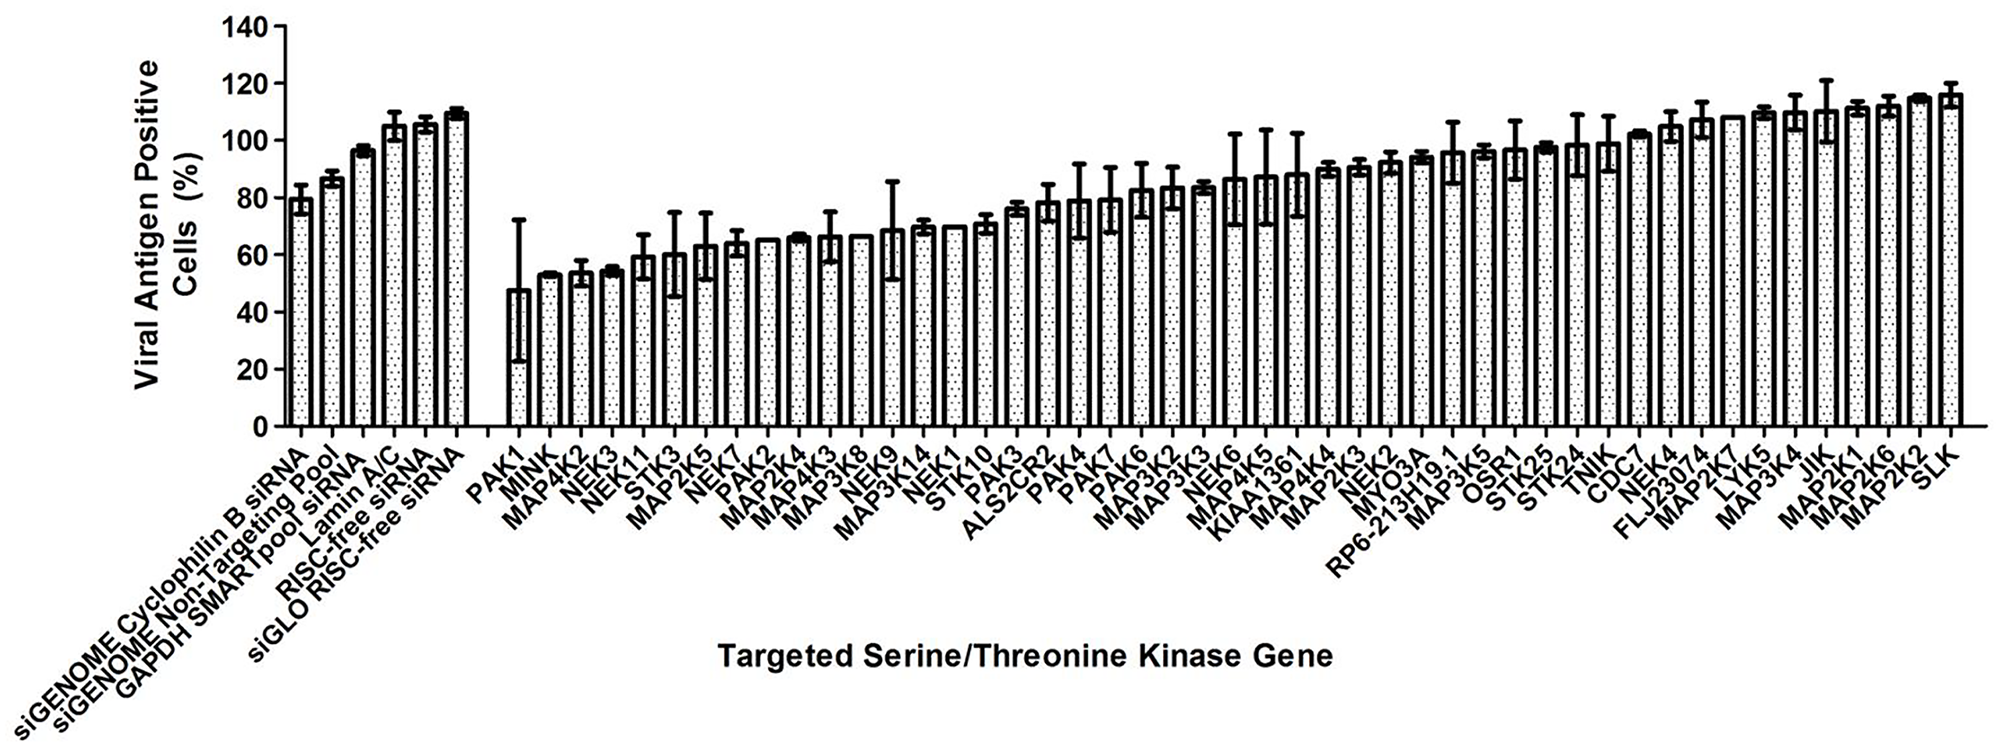 Human serine/threonine kinase siRNA library screen.